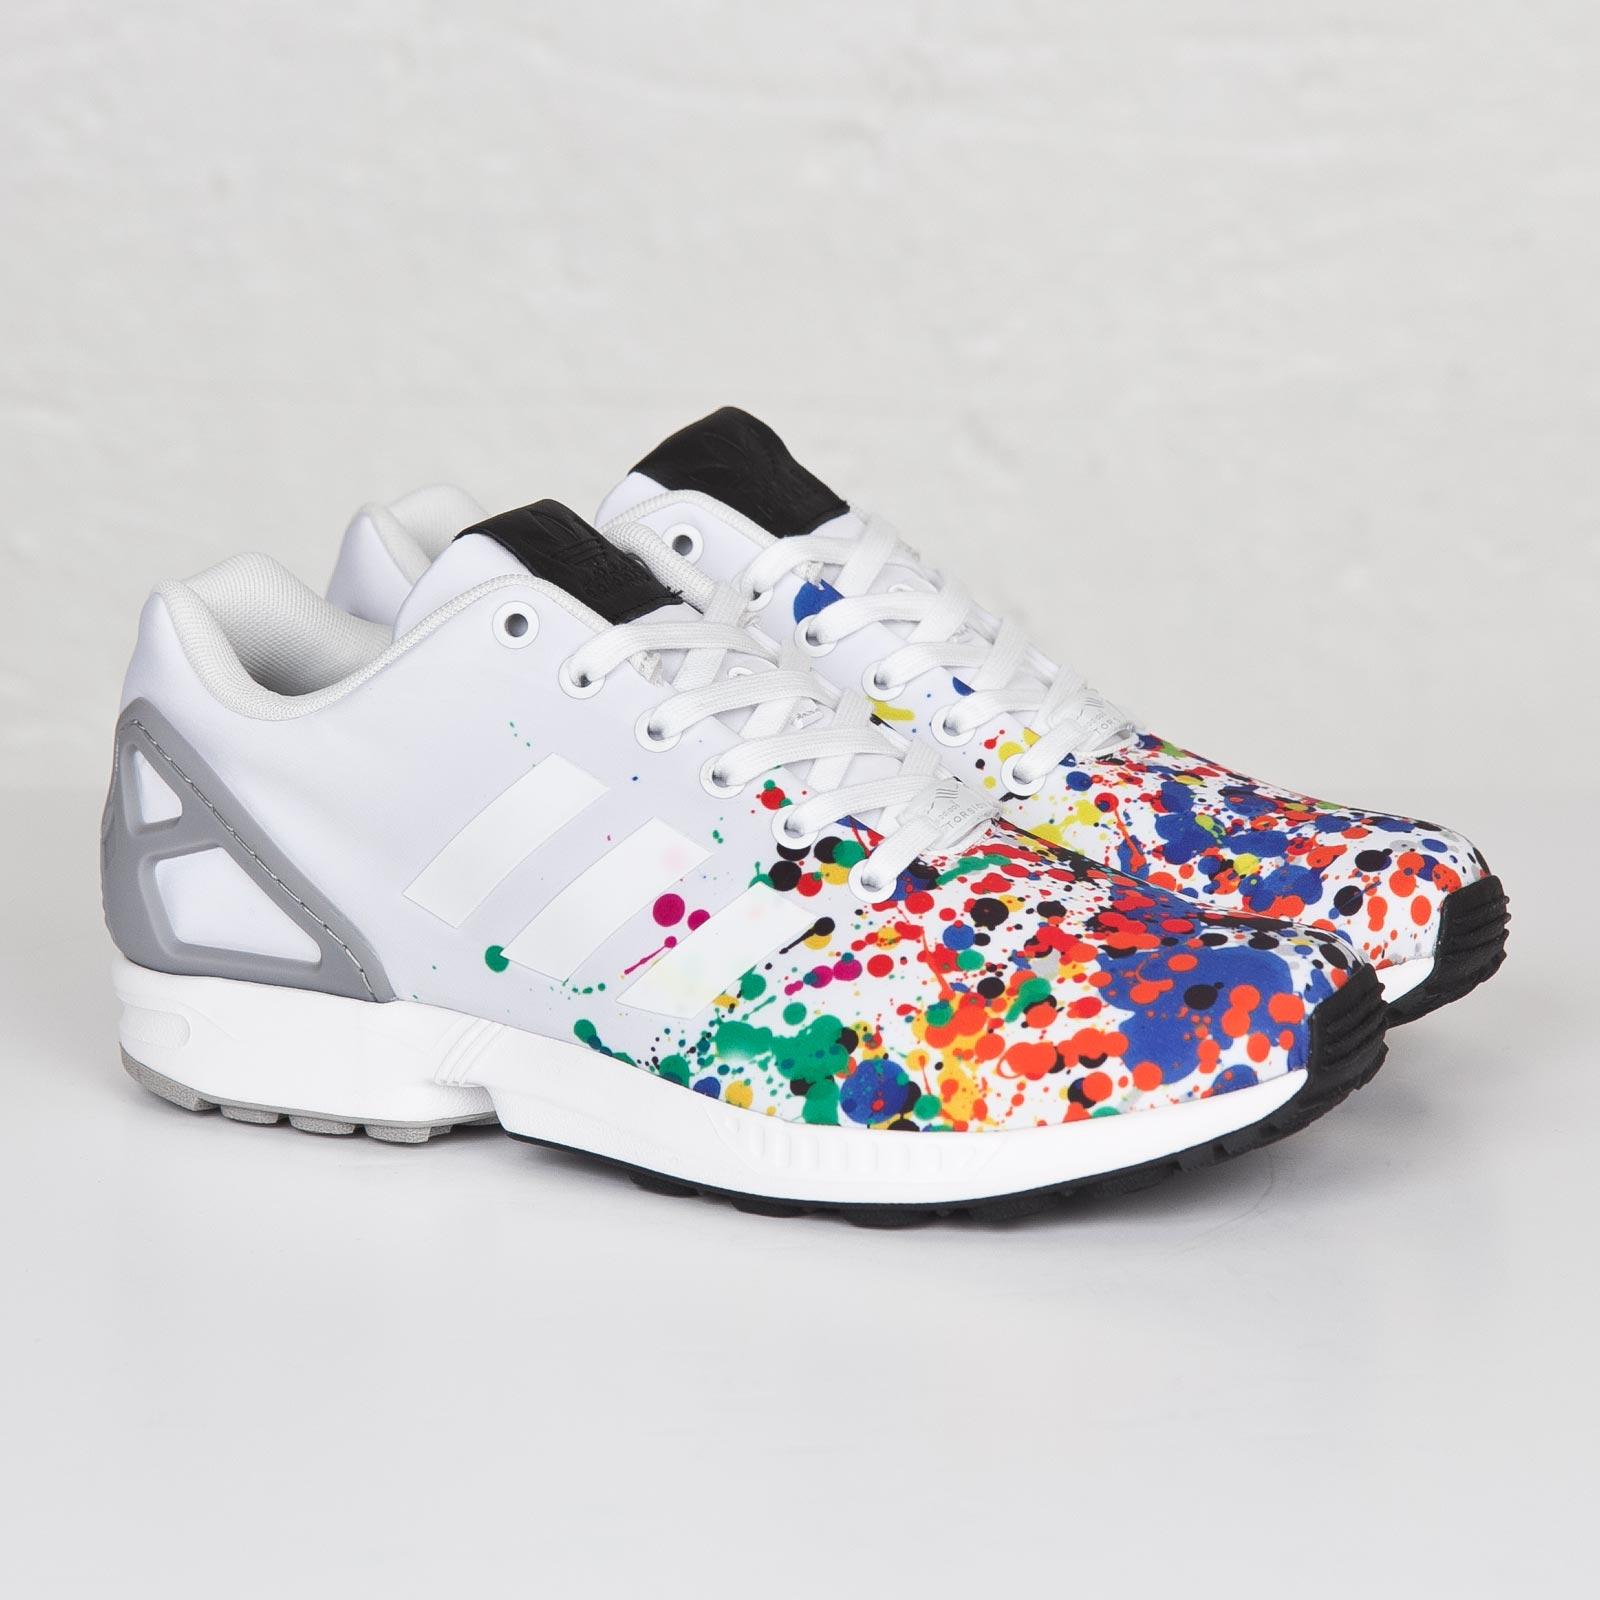 cheaper 19c88 5baf7 adidas ZX Flux - B34497 - Sneakersnstuff | sneakers ...